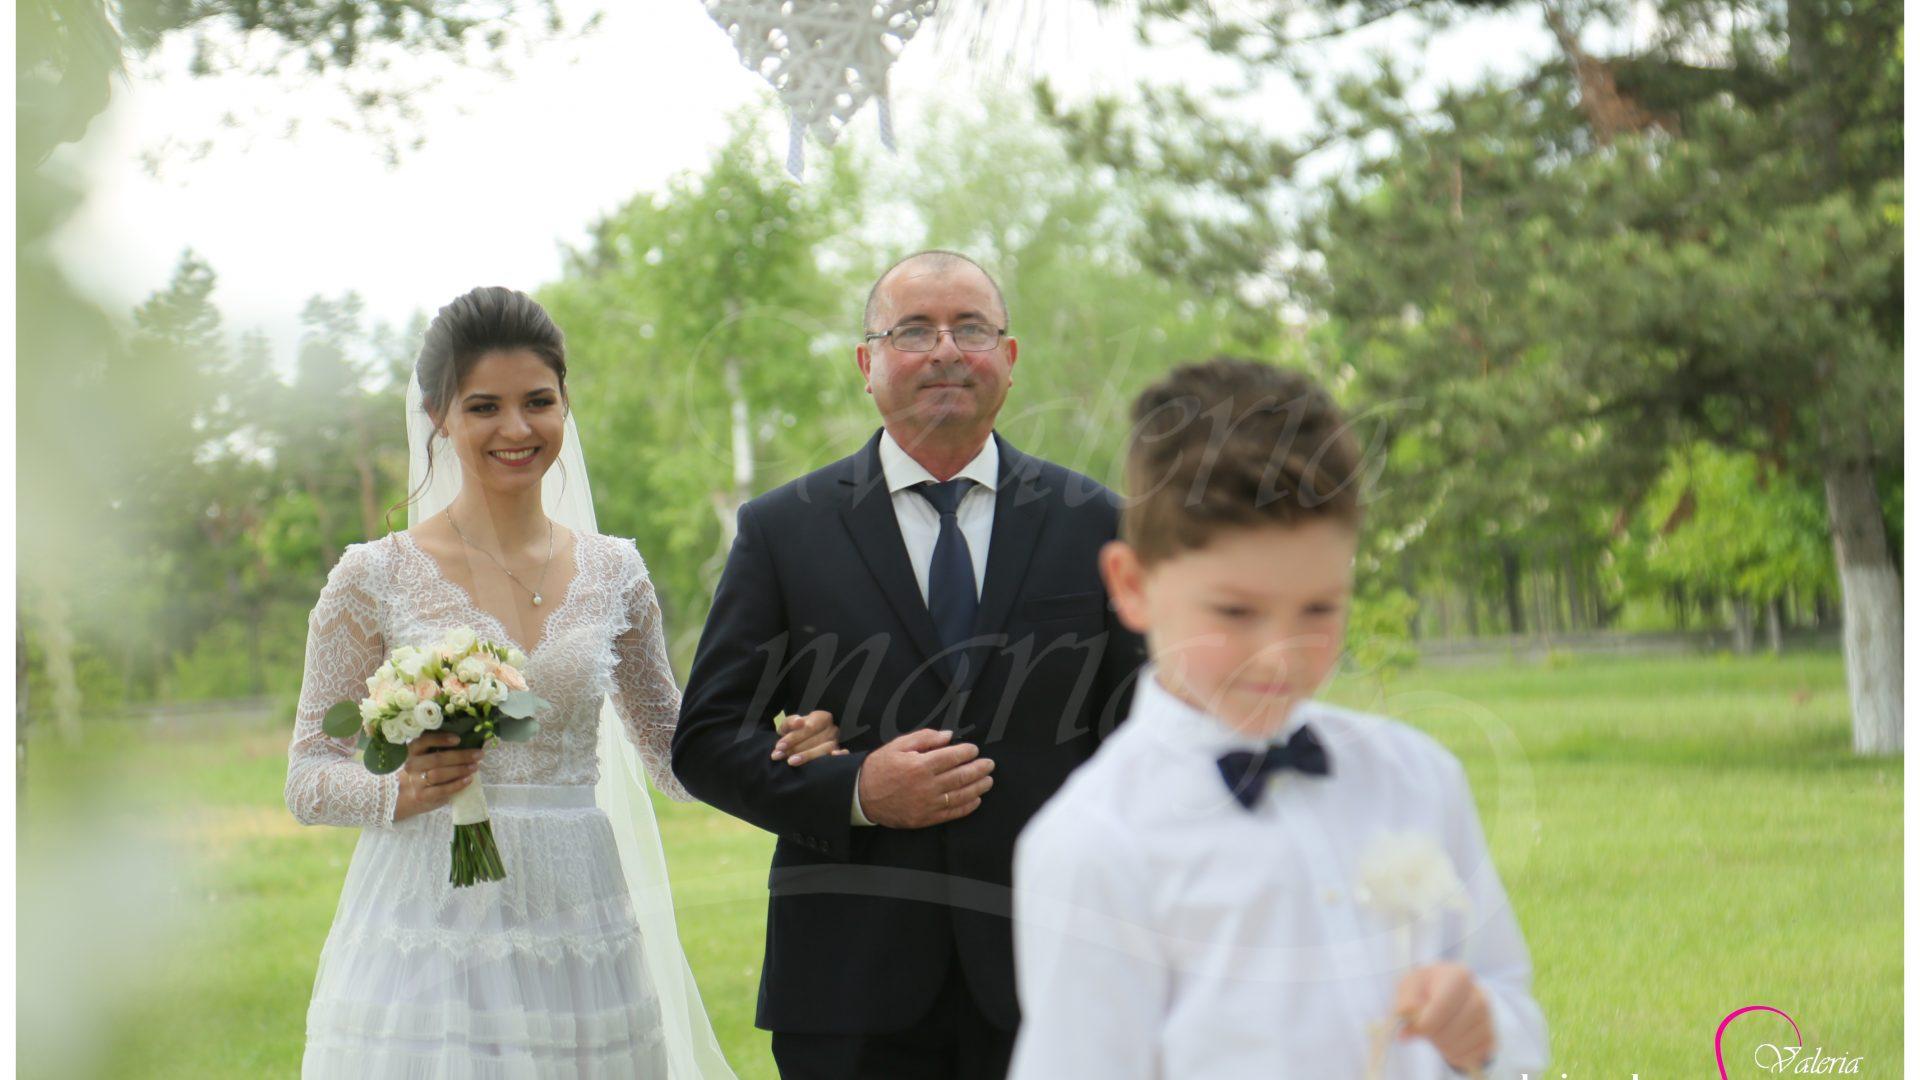 Inregistrarea casatoriei sub cerul liber Agentia Valeria Mariage 069787665 www.valeria (2)